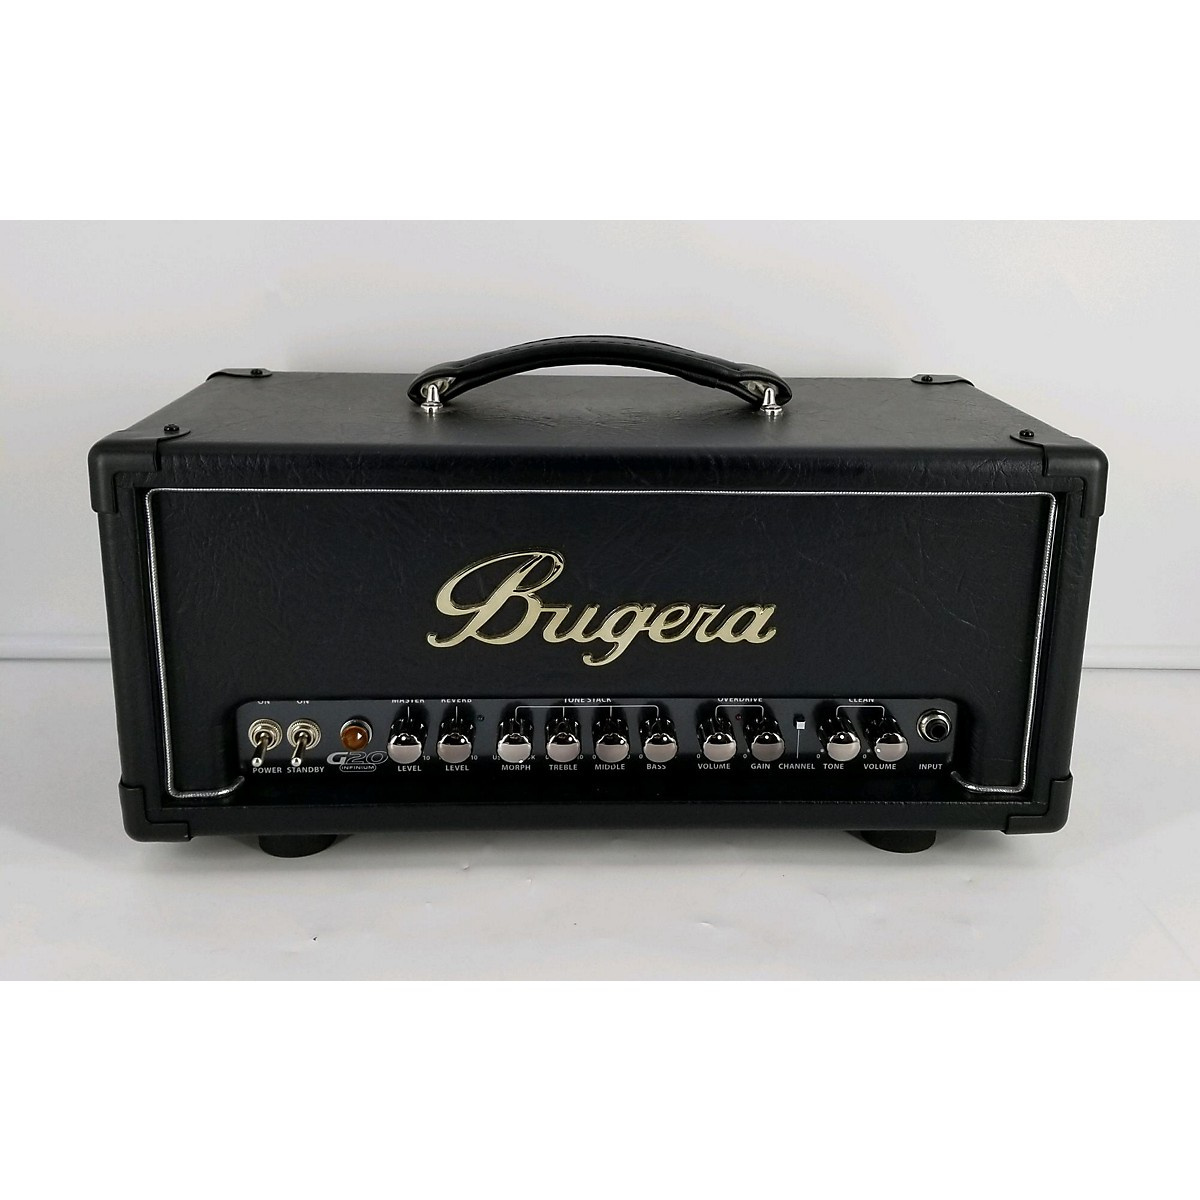 Bugera G20 Infinium Solid State Guitar Amp Head